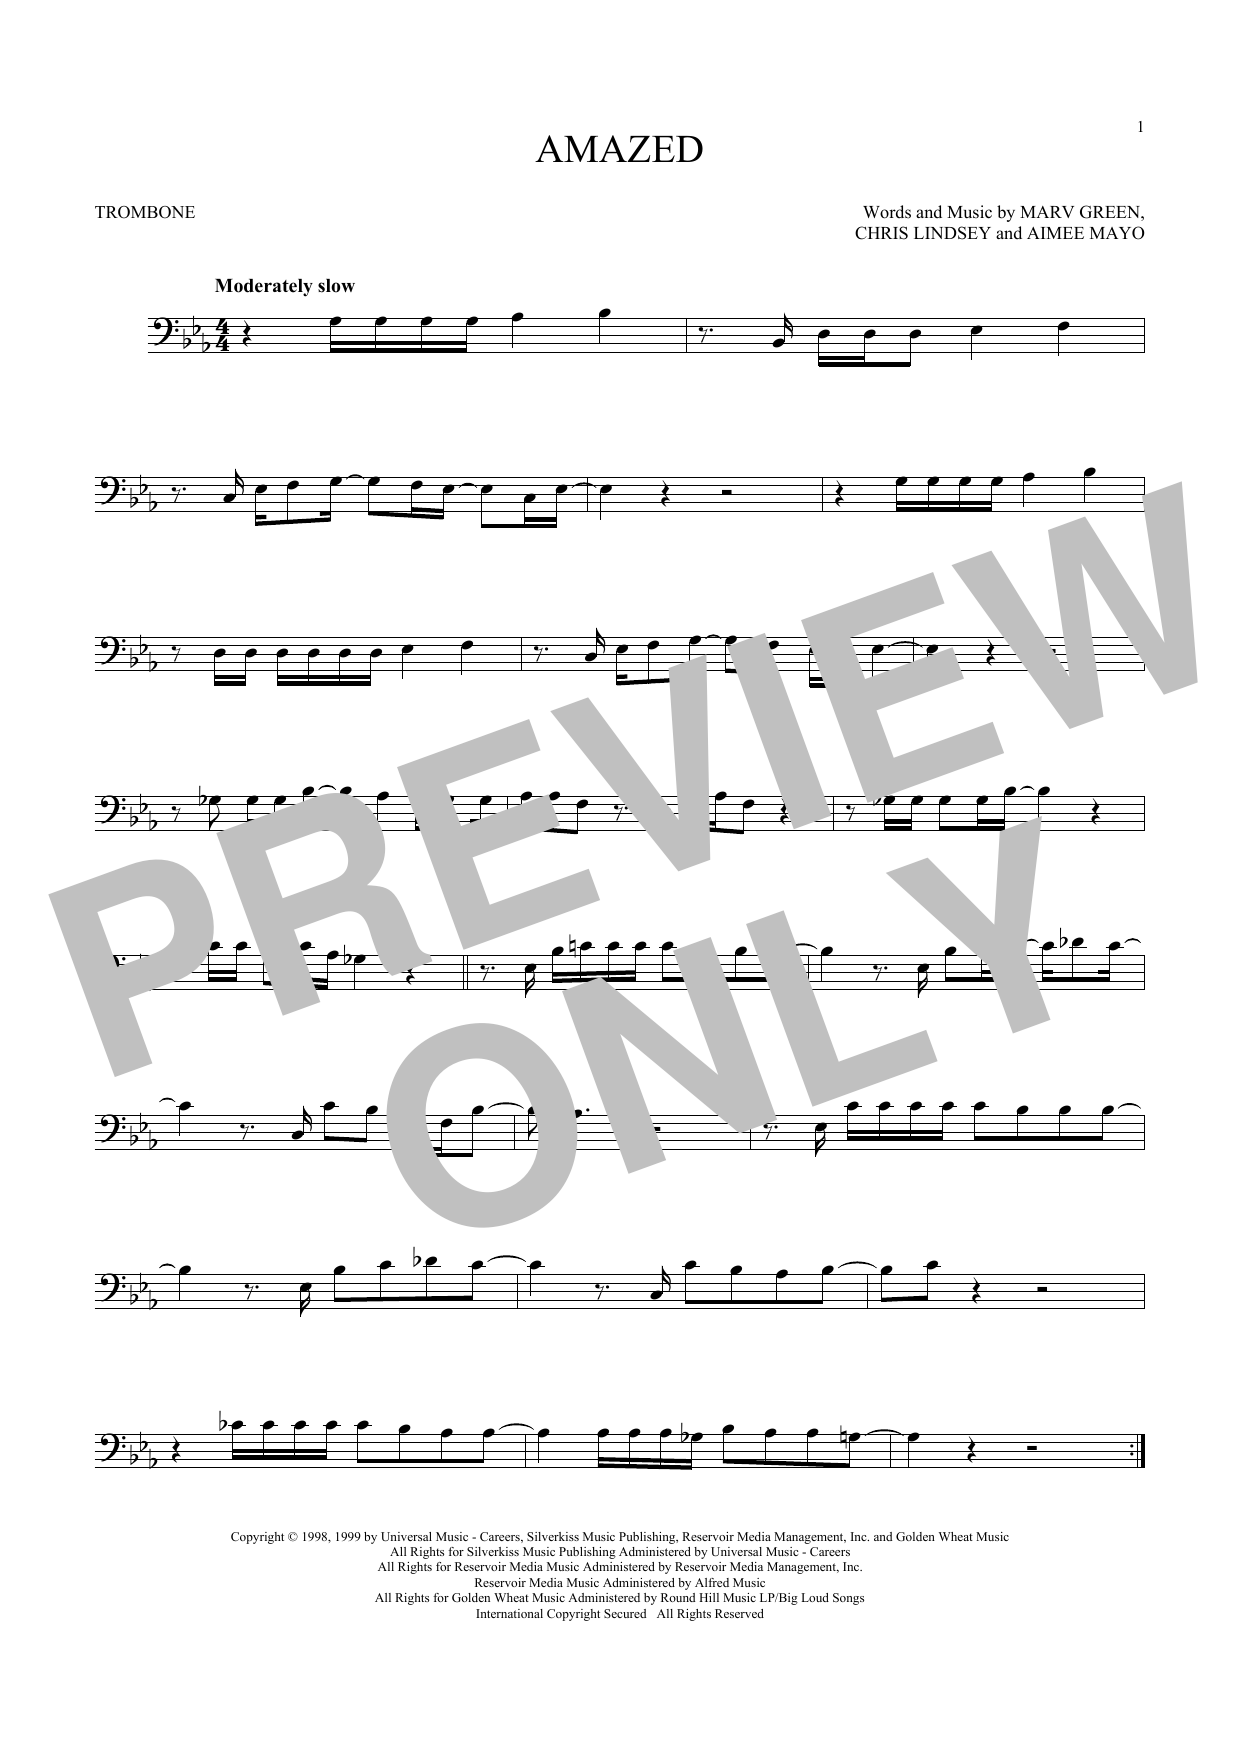 Amazed (Trombone Solo)